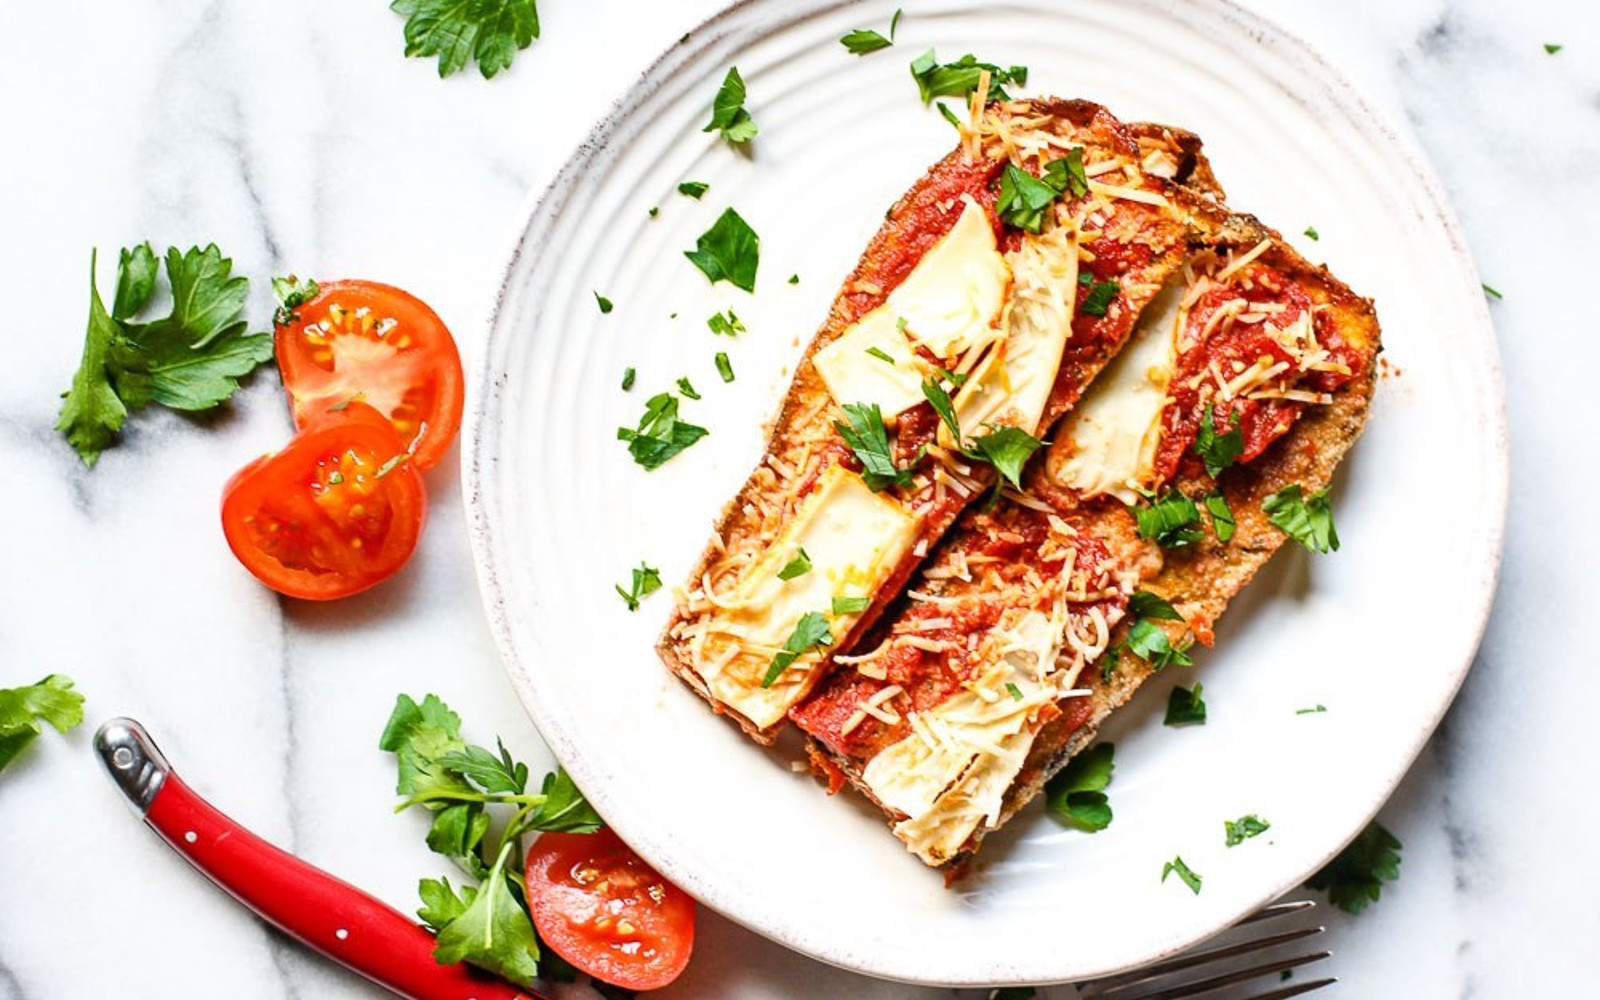 Paleo Eggplant Parmesan  Paleo Eggplant Parmesan [Vegan Gluten Free] e Green